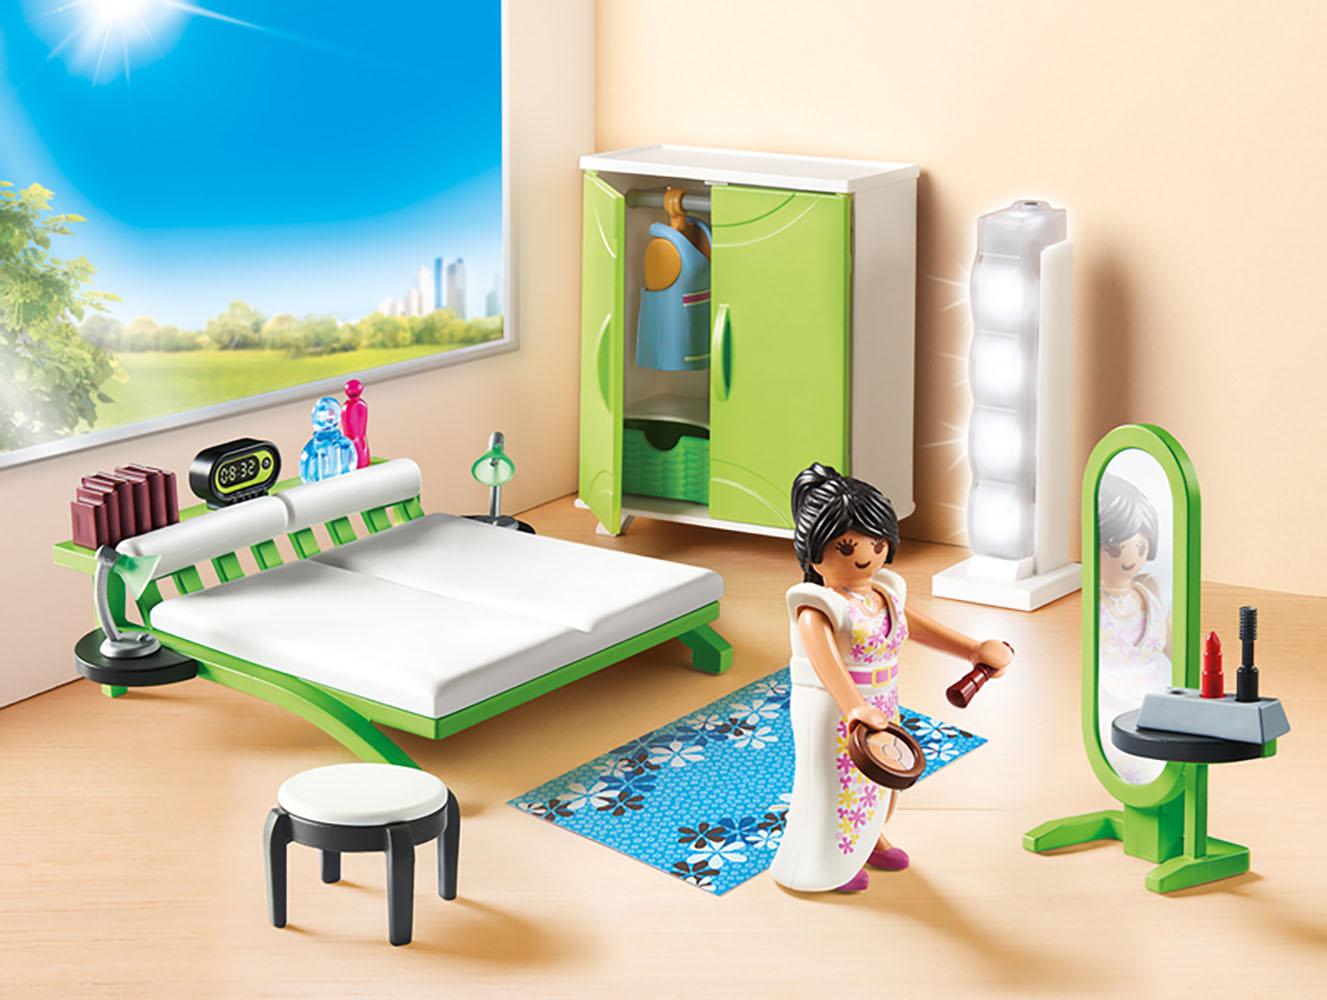 City Life - Chambre avec espace maquillage